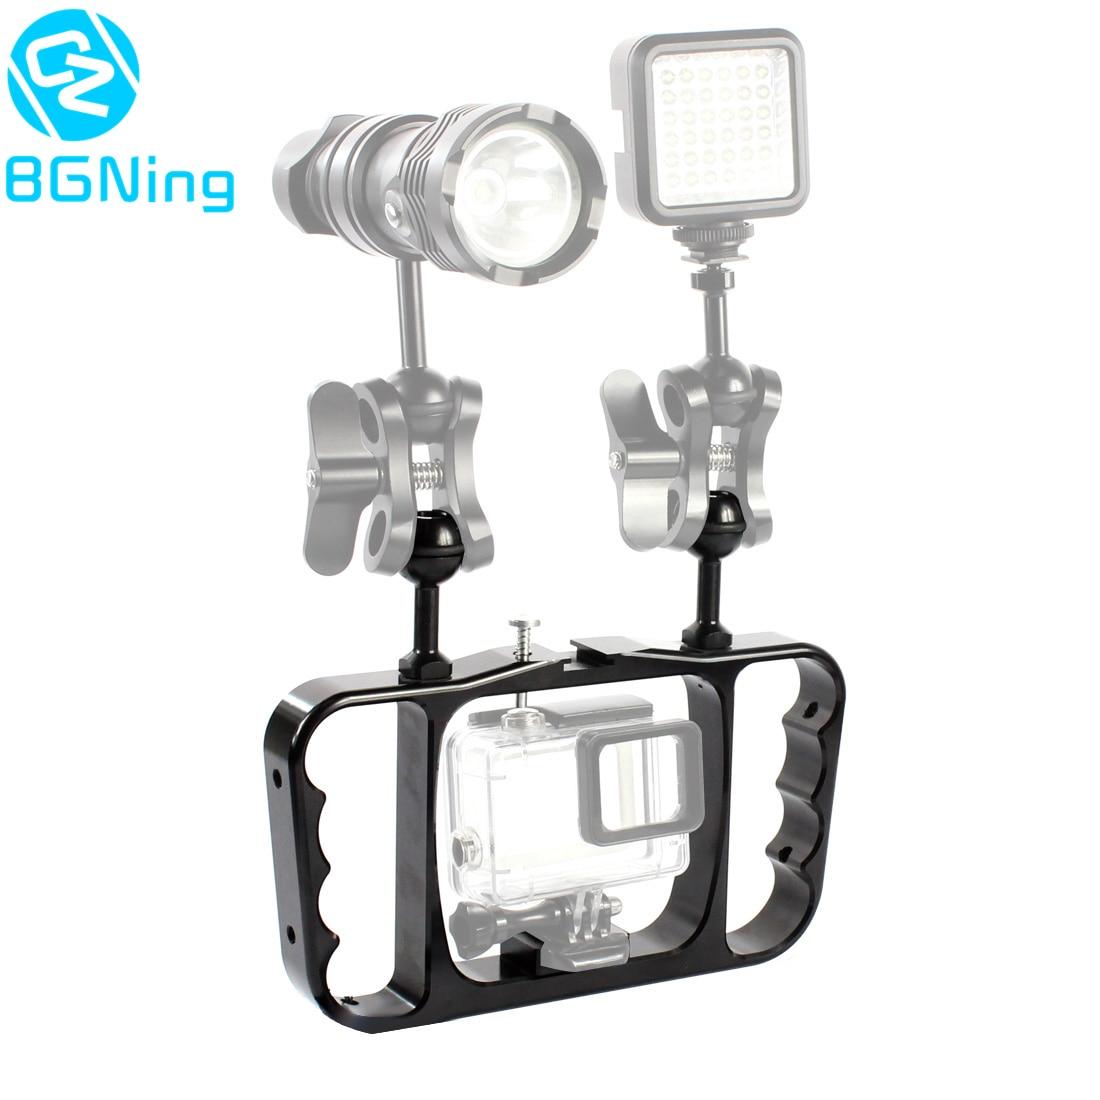 Dual Handle Scuba Diving Bracket Flash Light Mounting Frame Kit For Gopro Hero 7 6 5 4 SJCAM Sony Camera Camcorder Smartphone